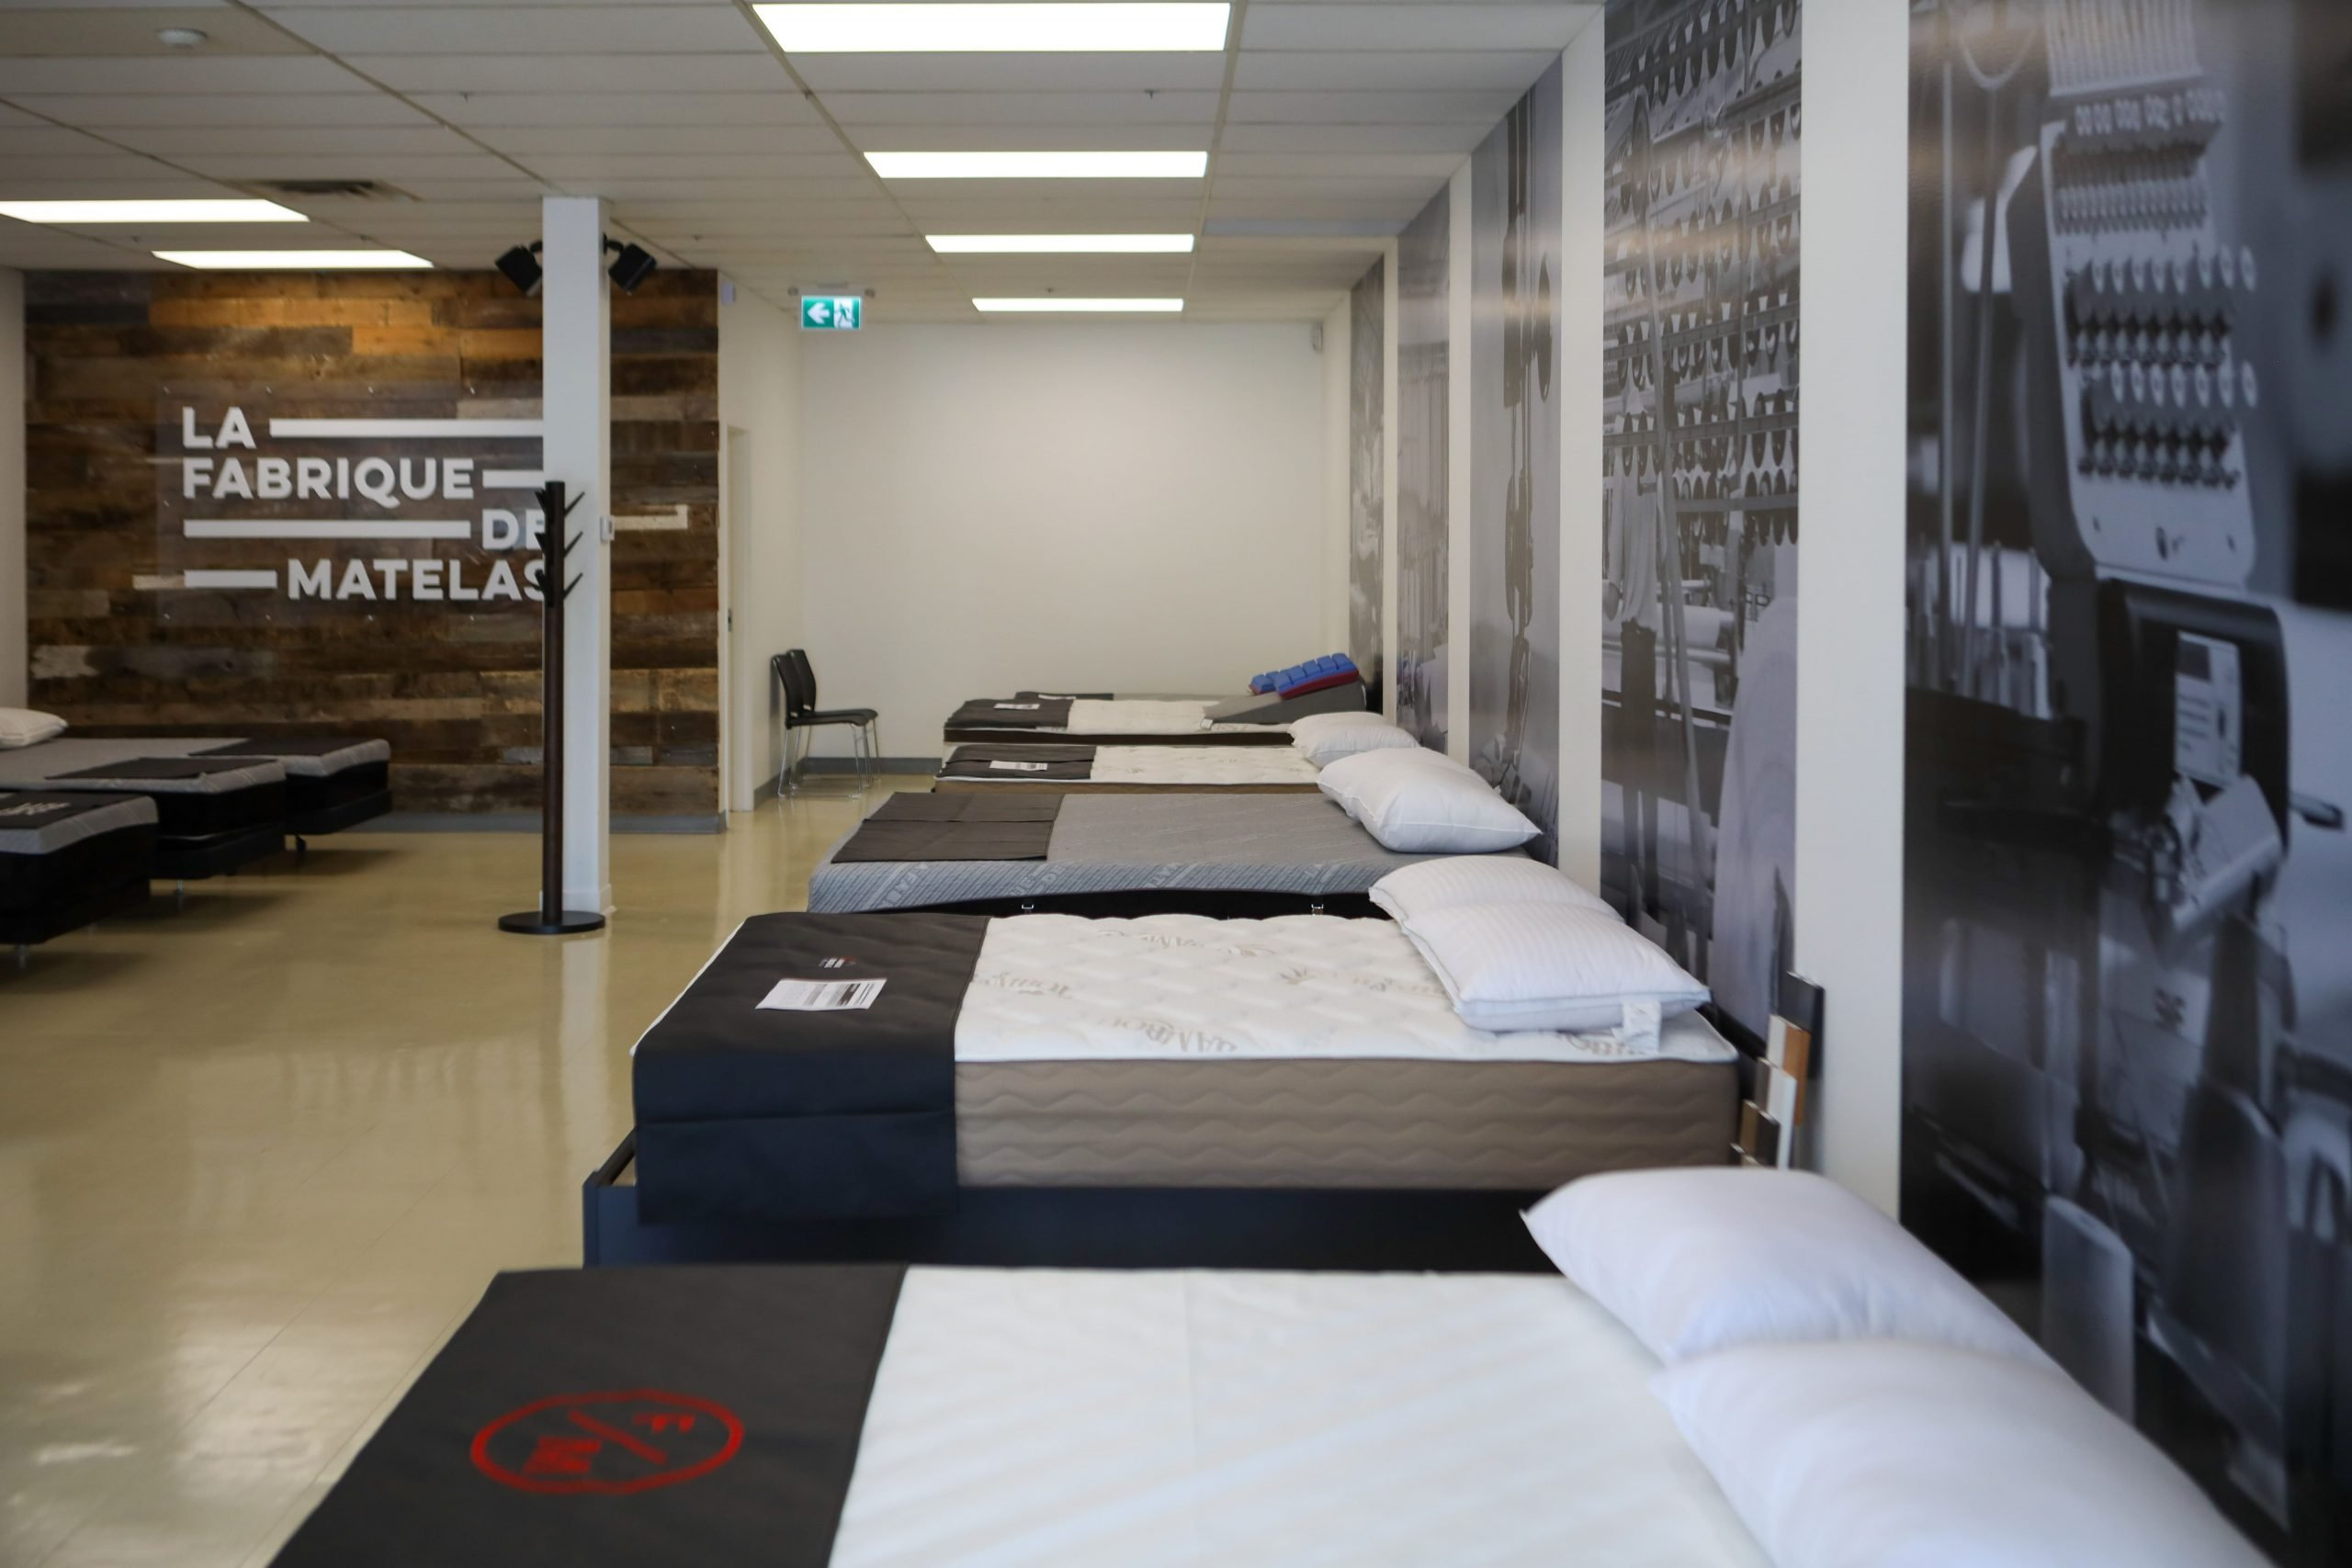 La Fabrique de matelas - Application image de marque - murales magasin